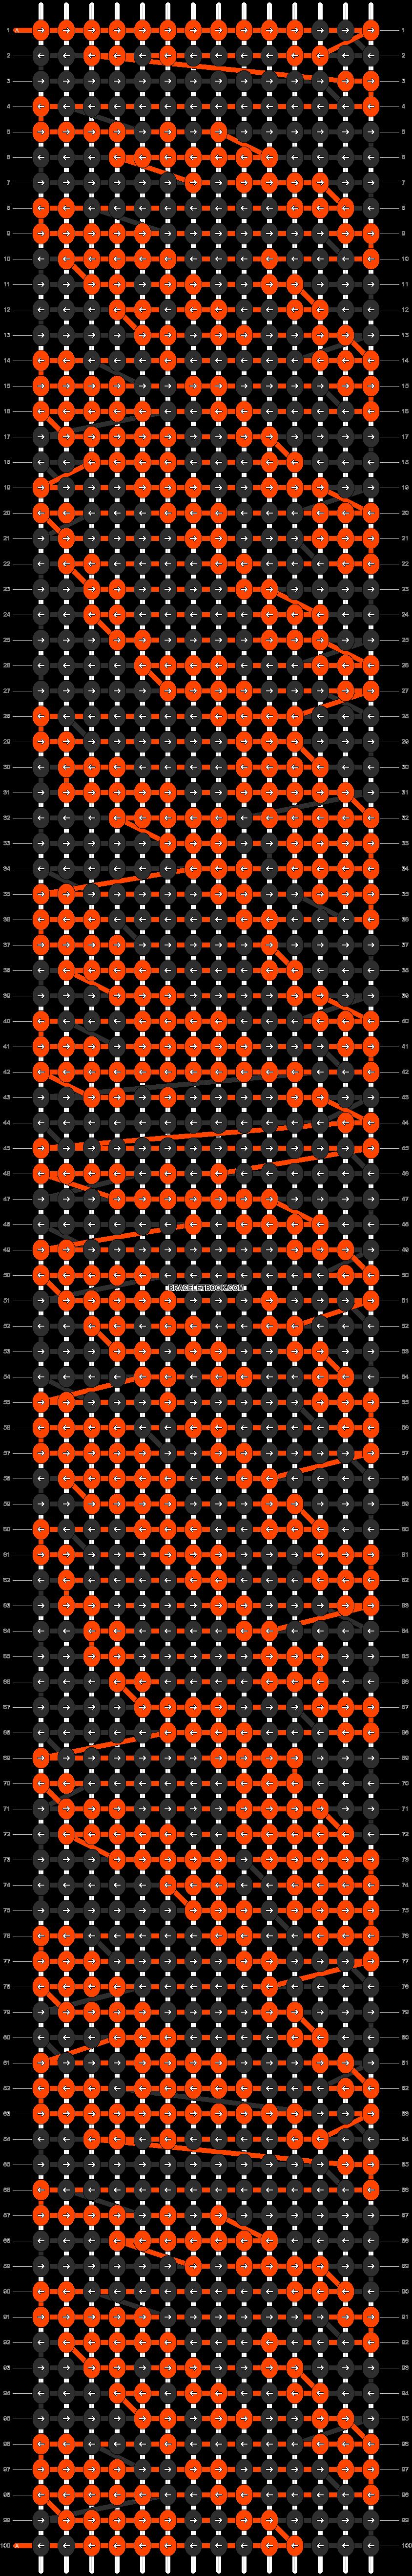 Alpha Pattern #2632 added by kristiney